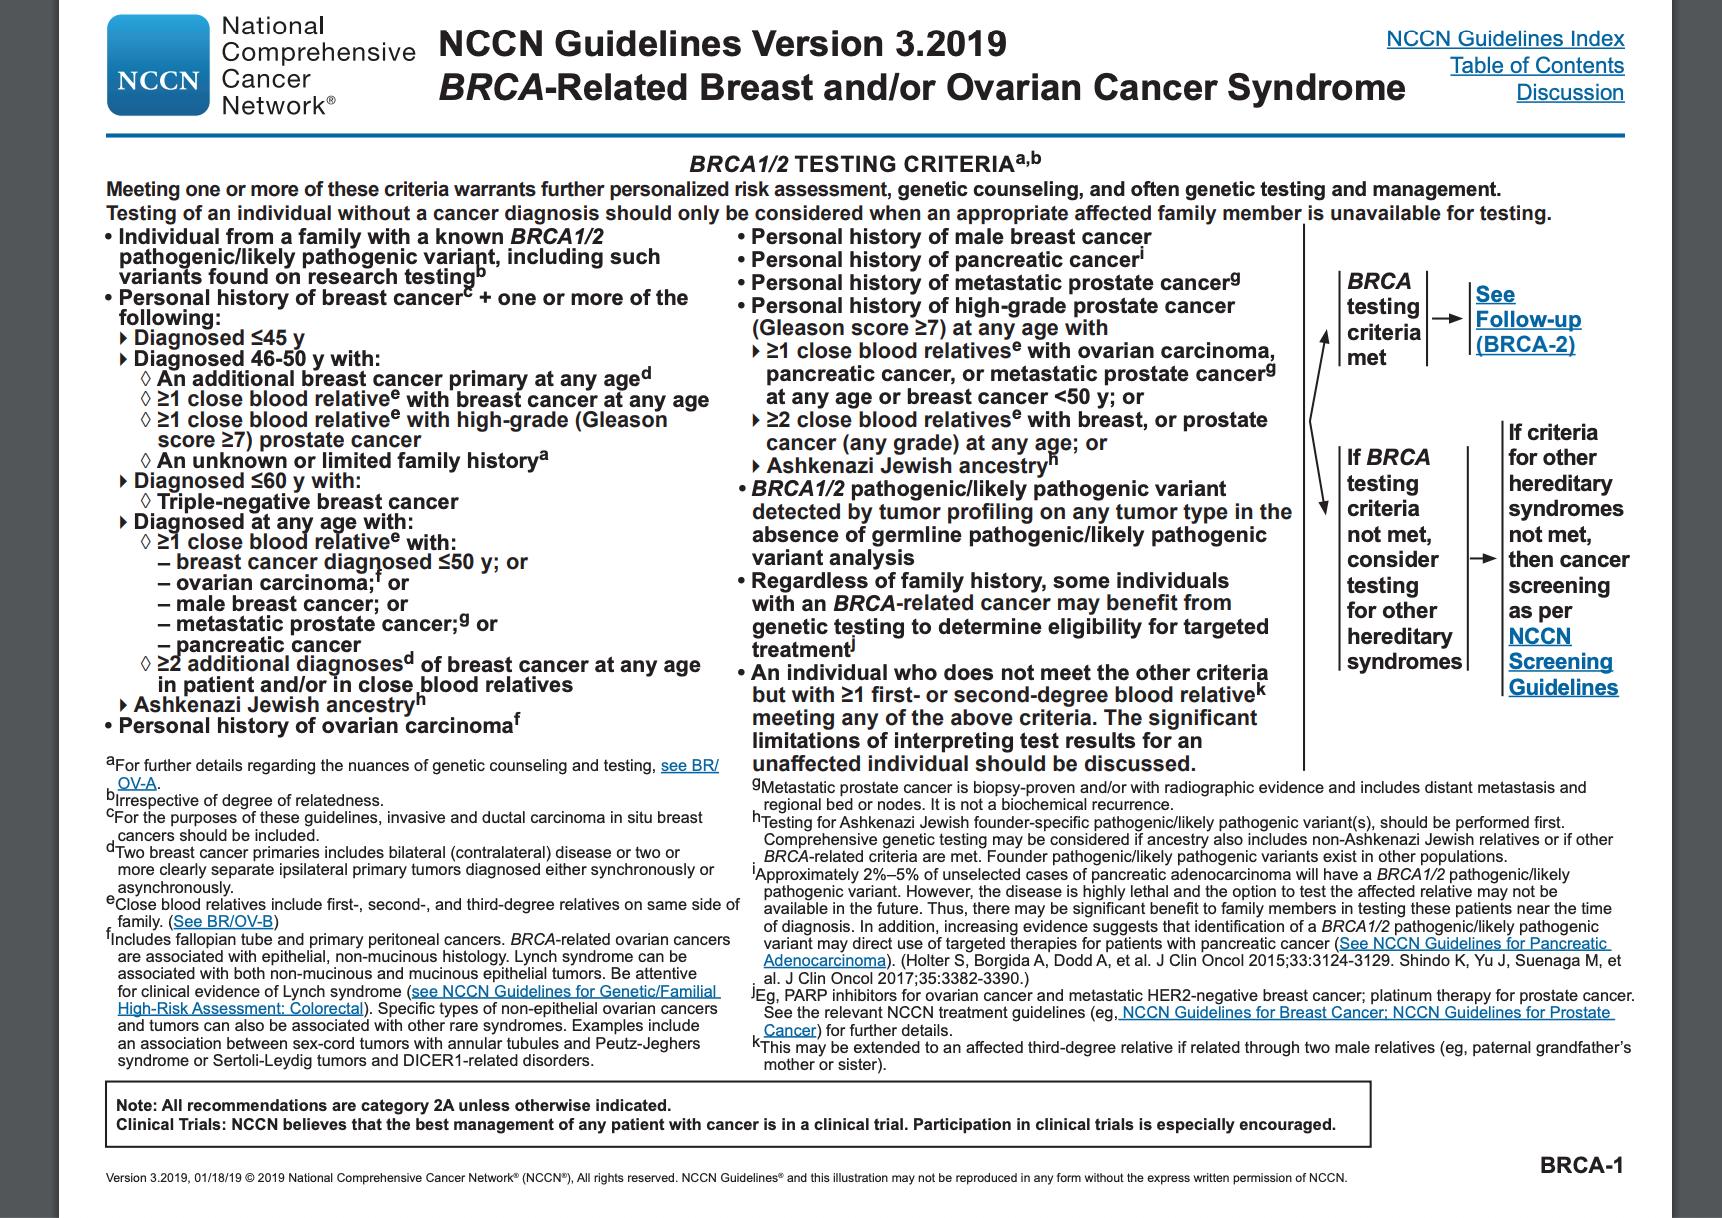 familial cancer risk assessment tool